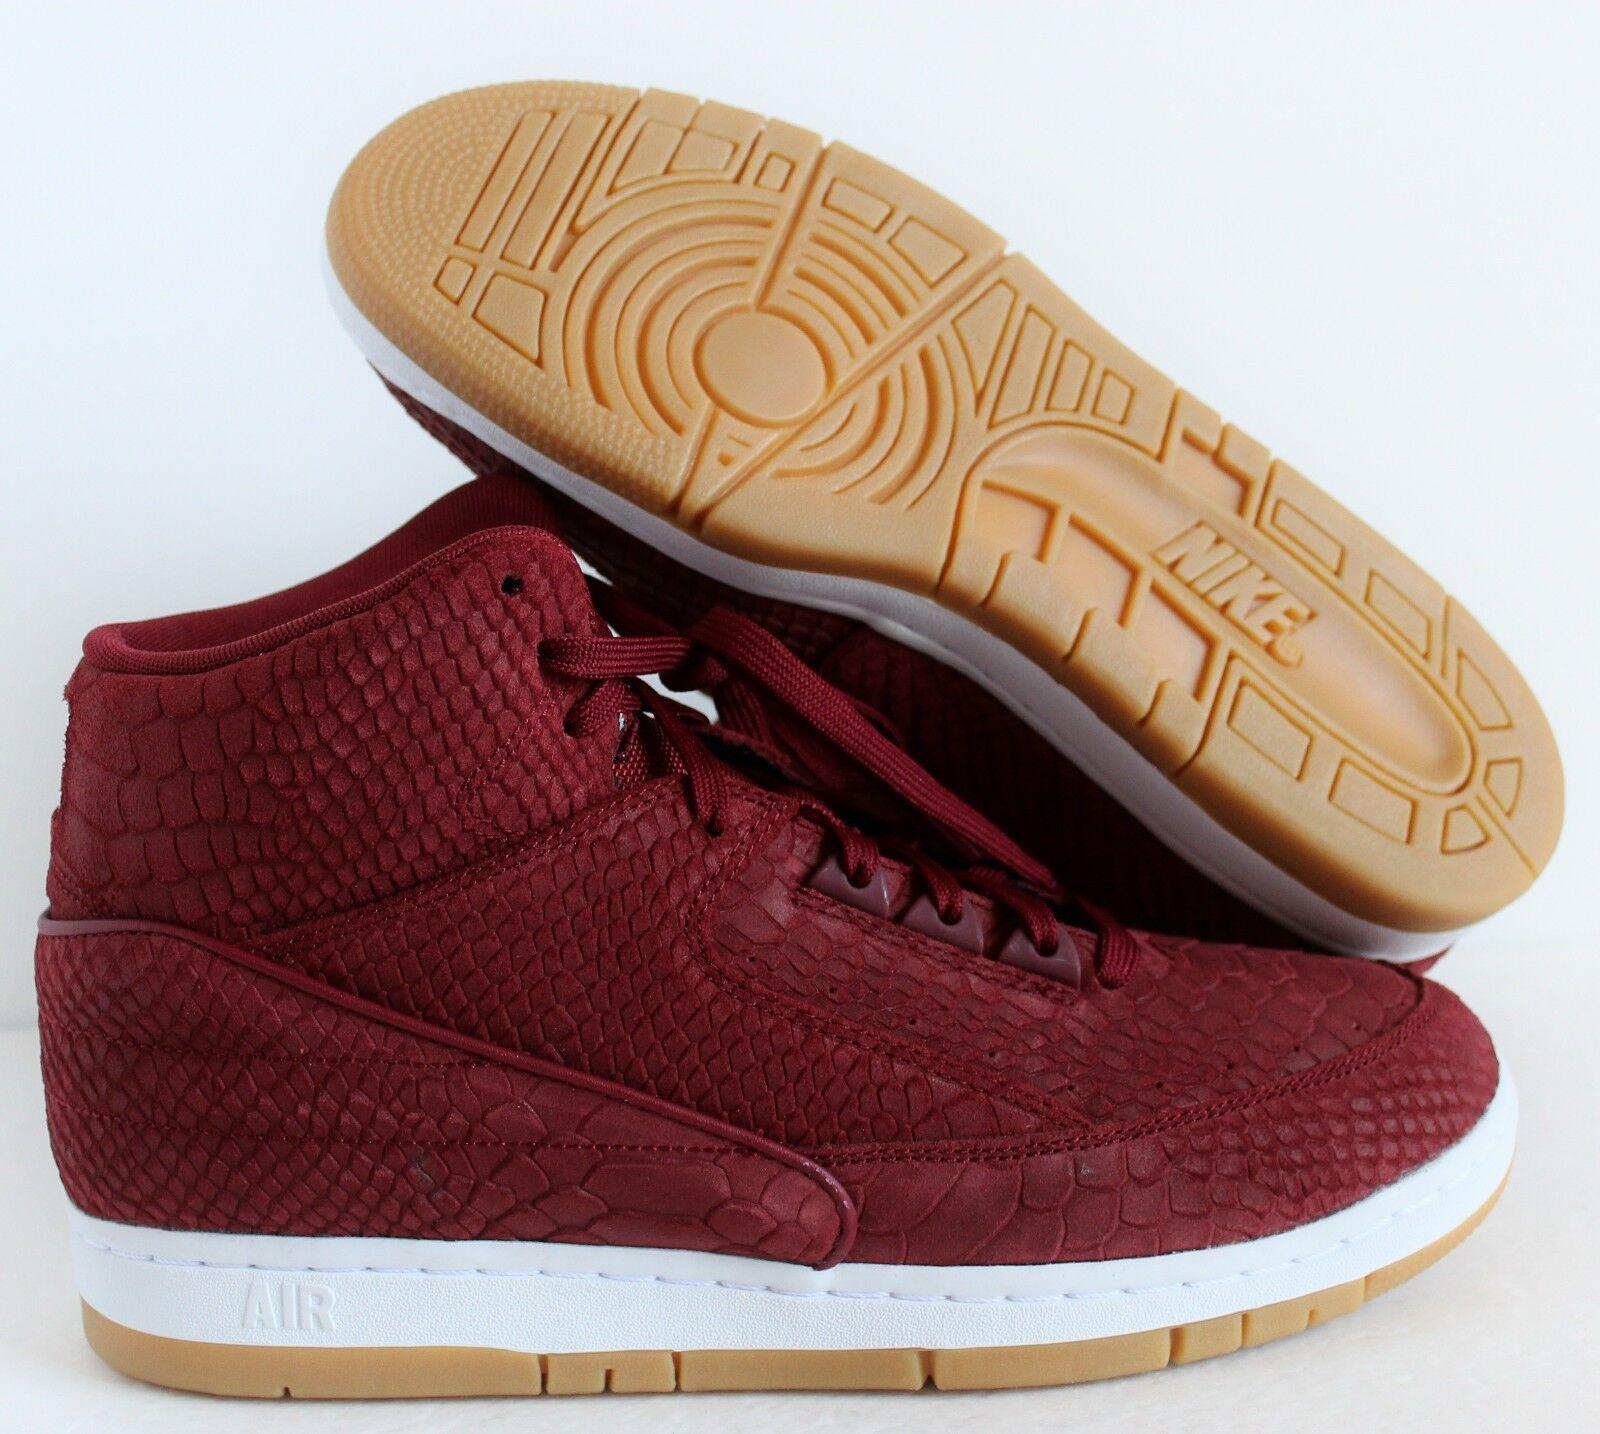 Nike Men Air Python Premium Team Red/White/Gum Price reduction Cheap and beautiful fashion